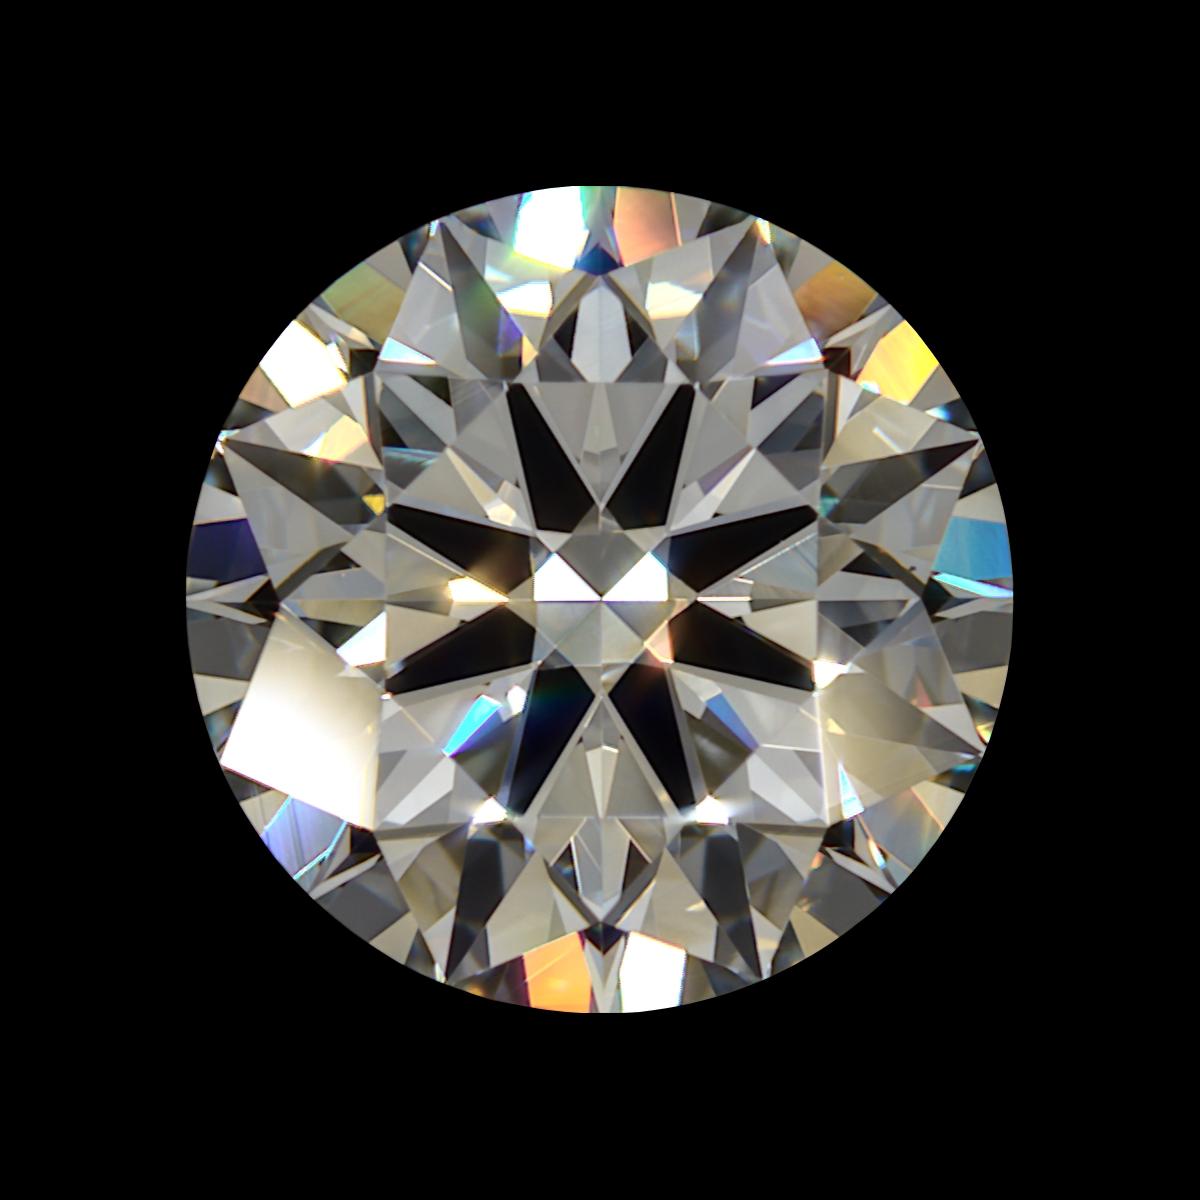 https://cdn.briangavindiamonds.com/files/mp4/BLAGS-104108734016/BLAGS-104108734016-Fire-02.mp4